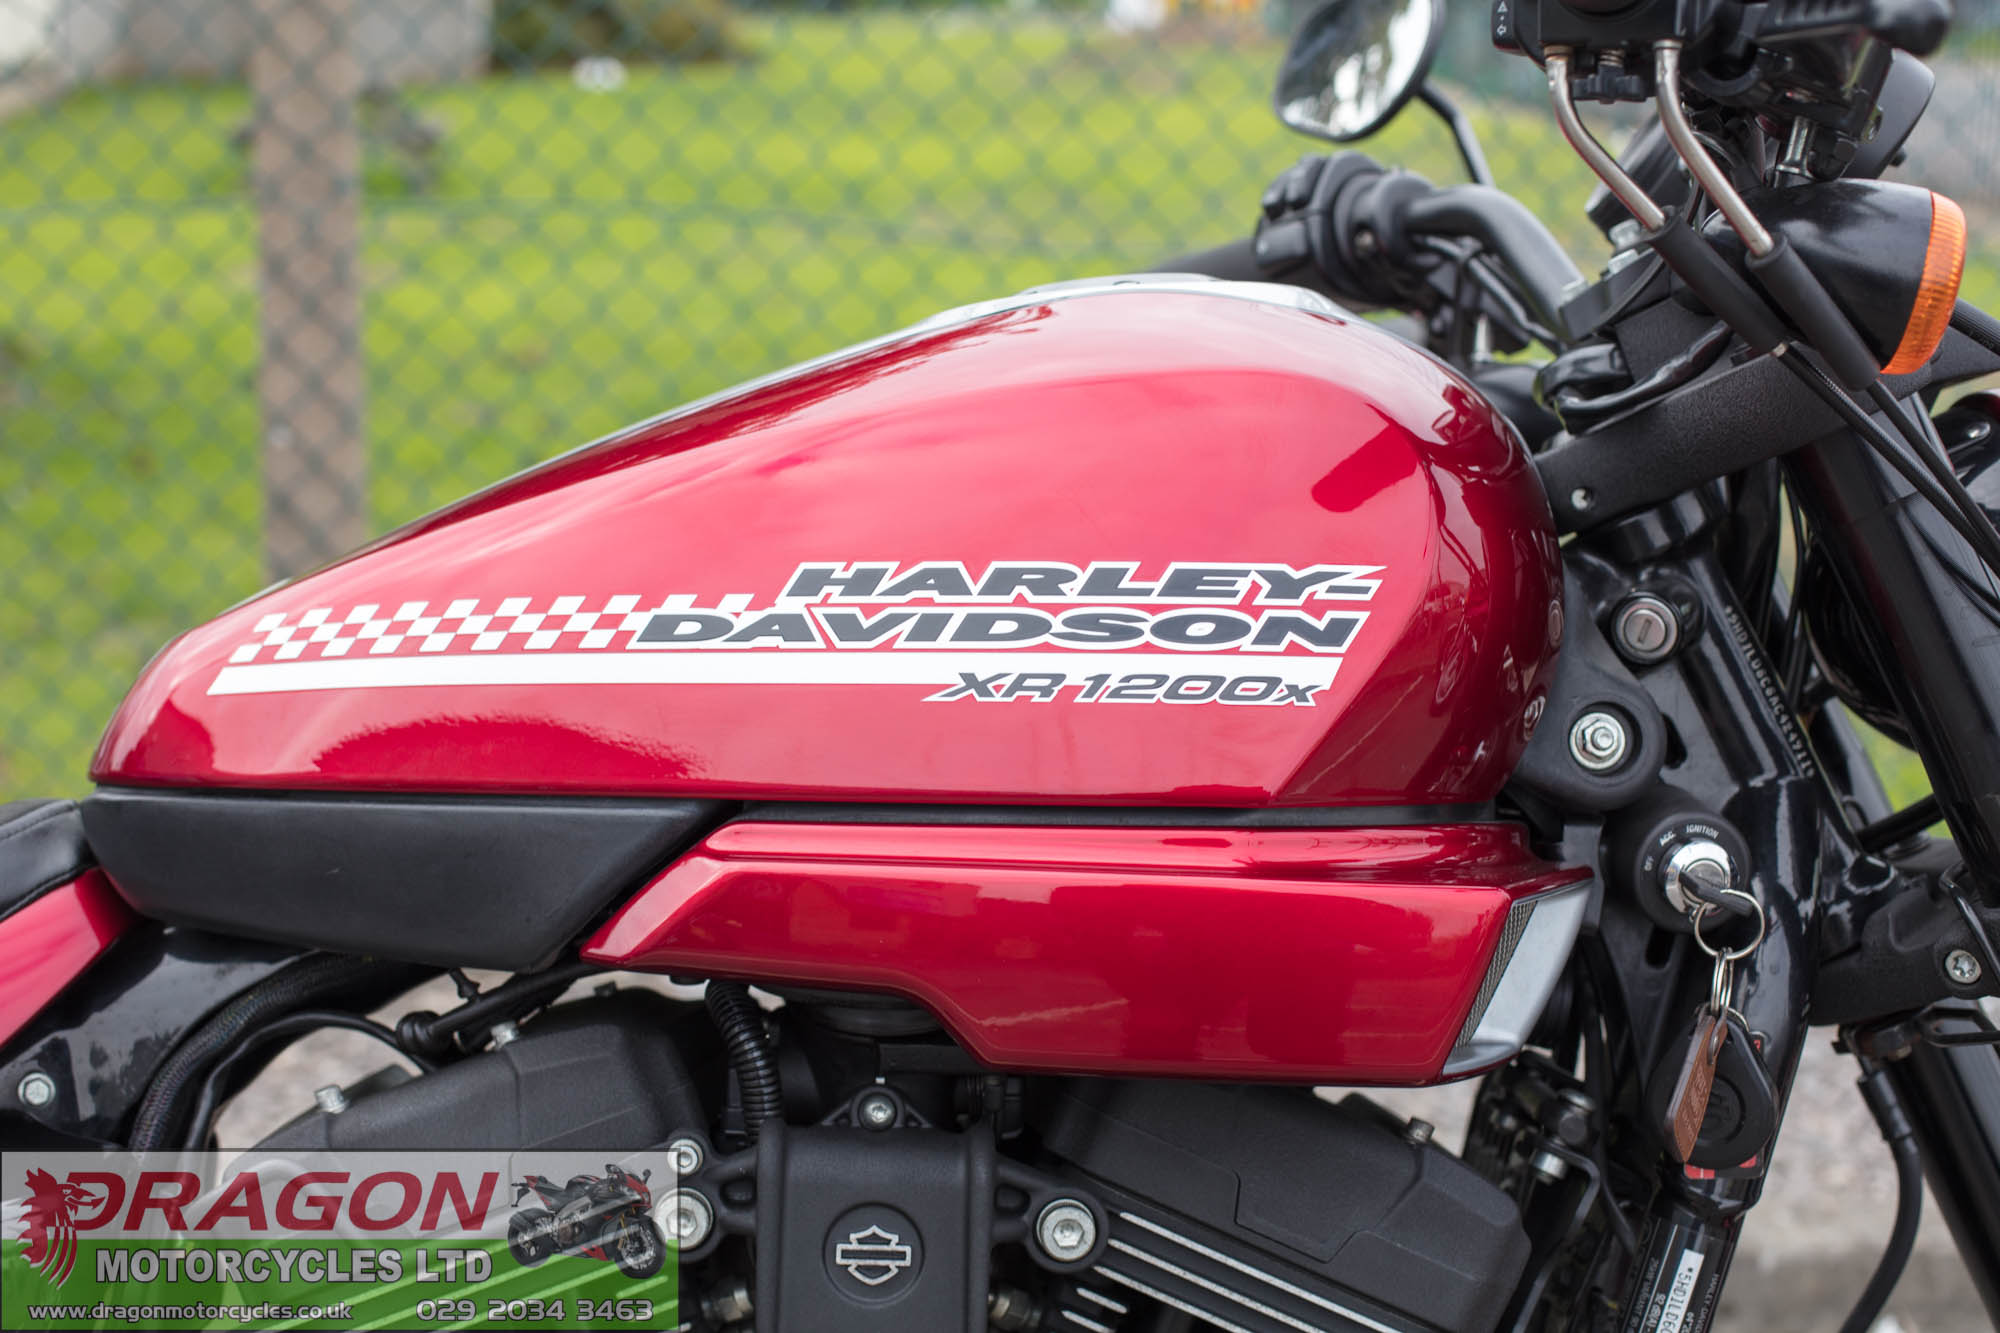 For Sale 2010 Harley Davidson XR1200X | Red/Black | Six